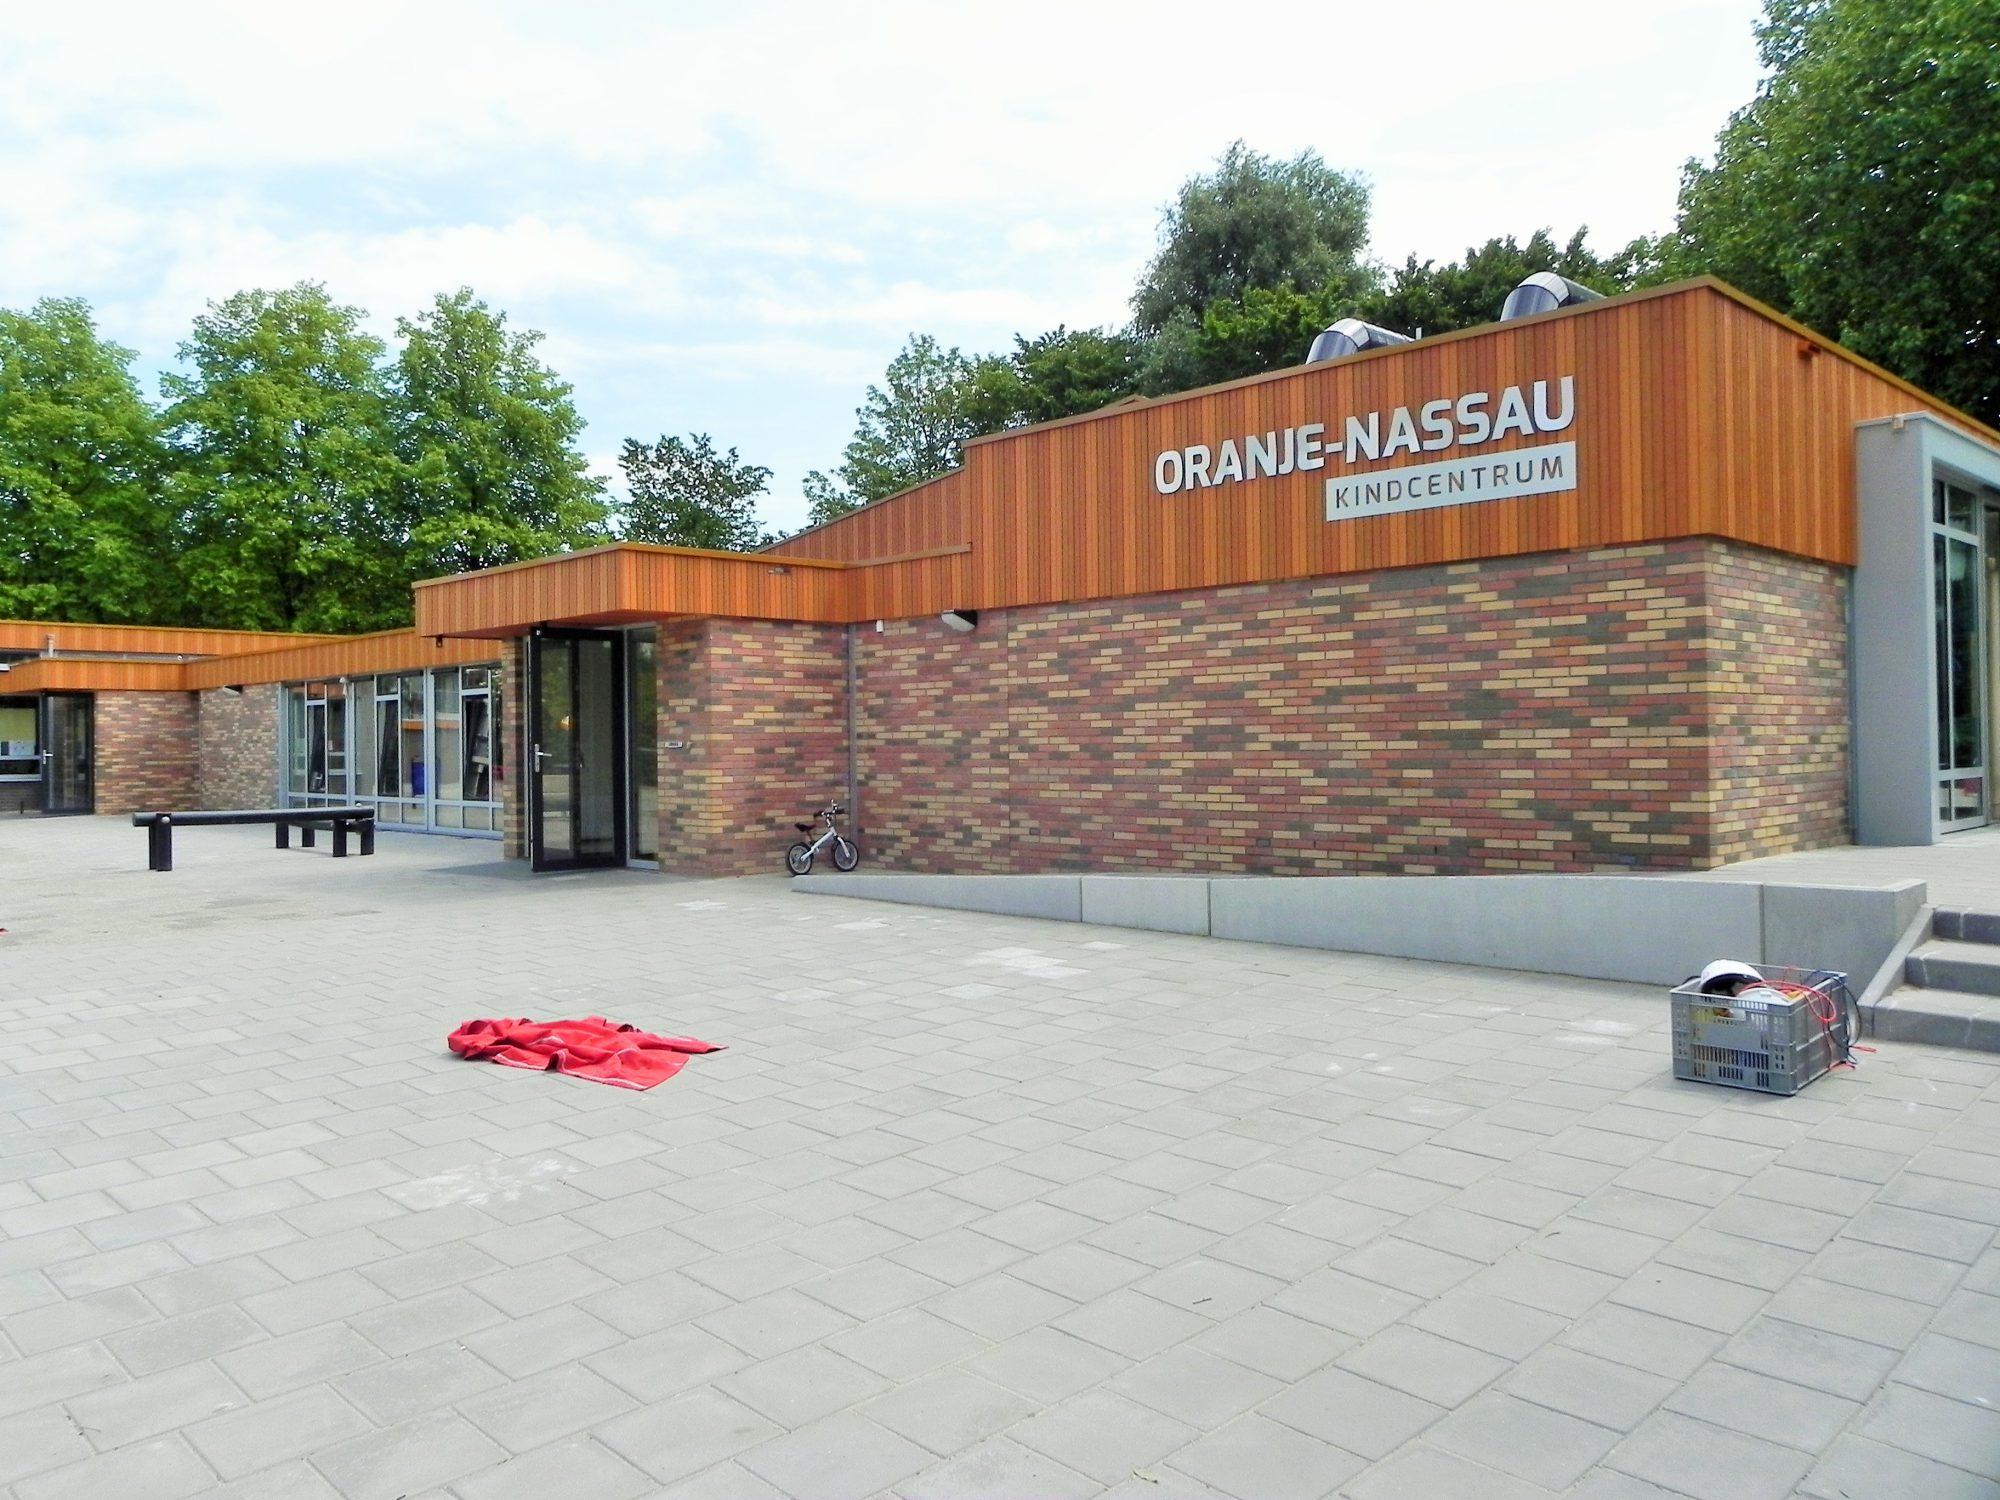 Kindcentrum Oranje-Nassau Papendrecht